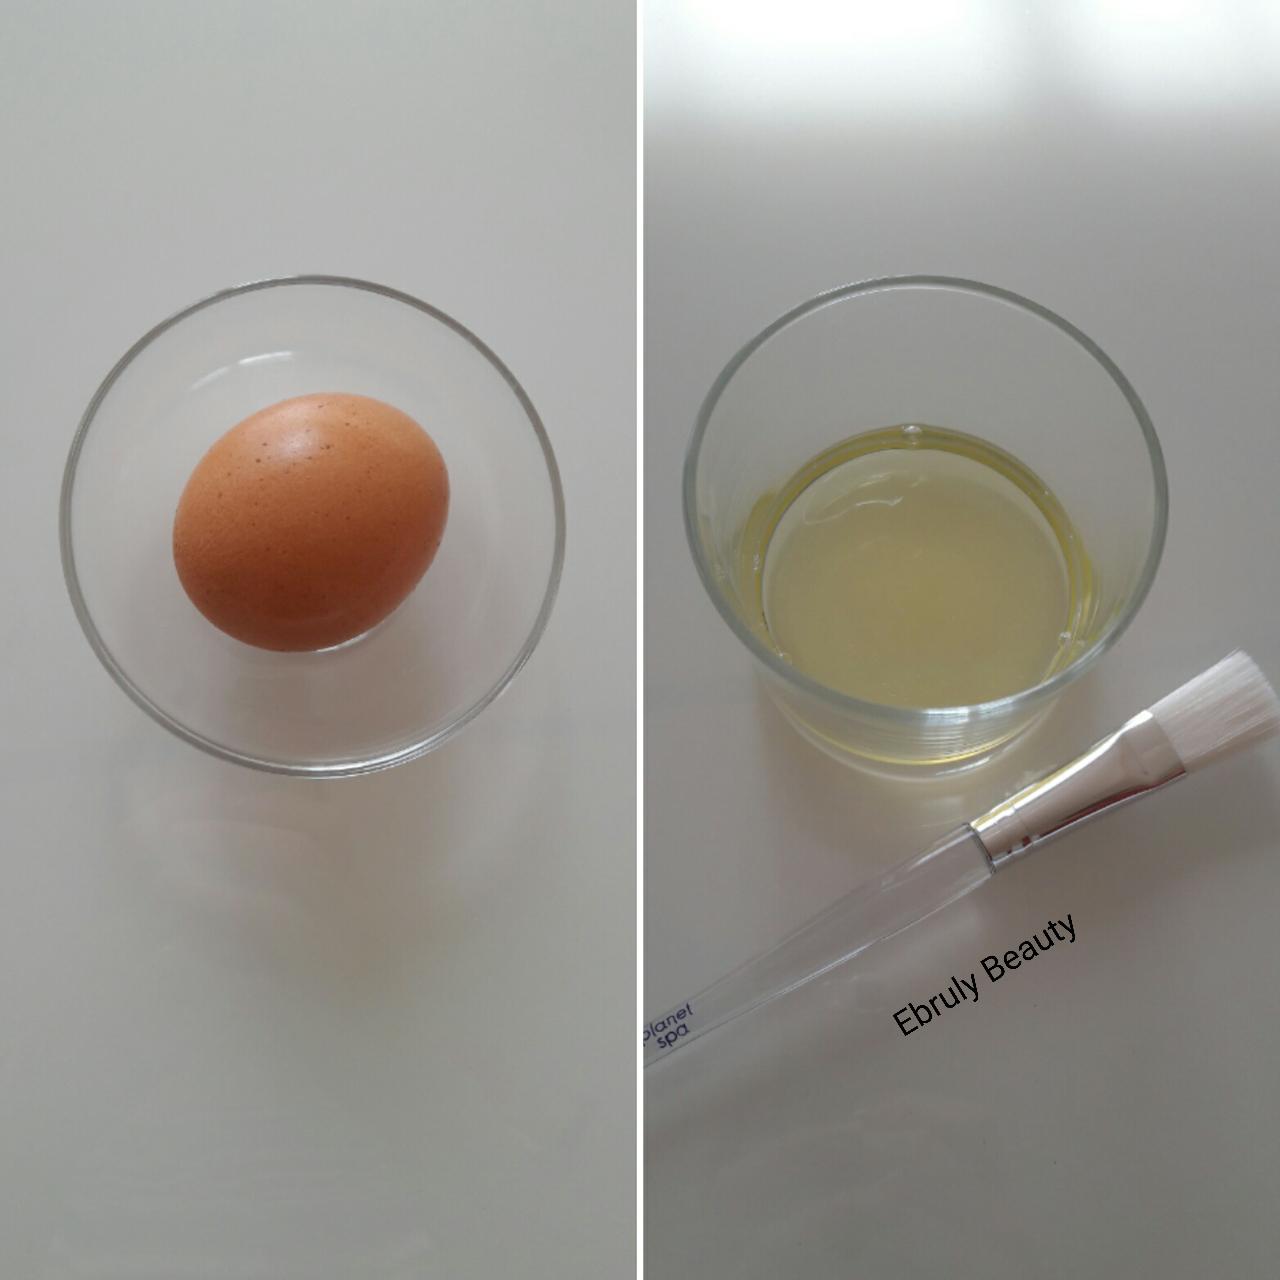 Etiket: yumurta akı